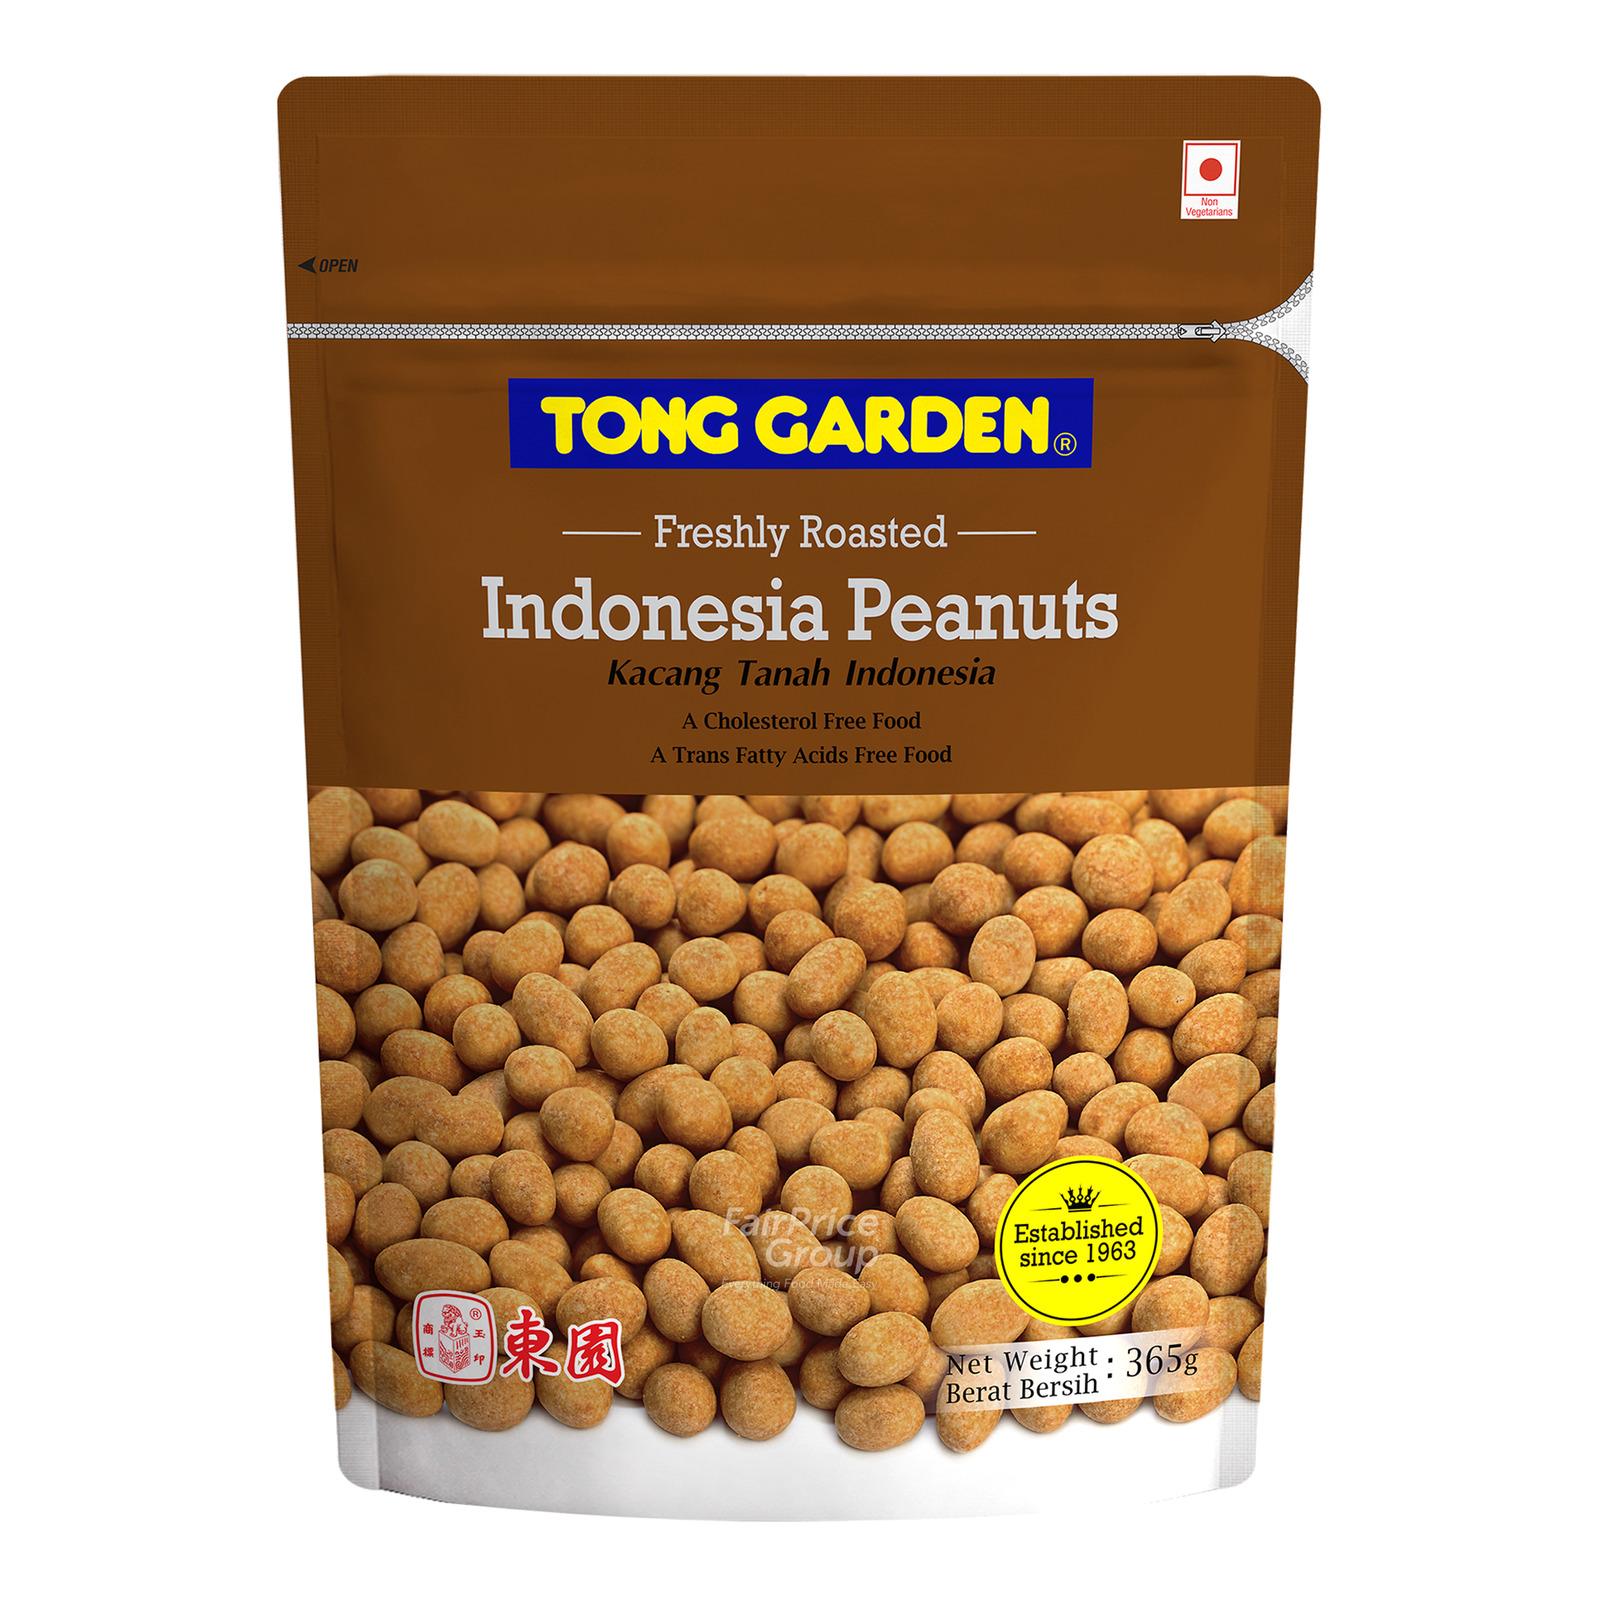 Tong Garden BBQ Coated Peanuts